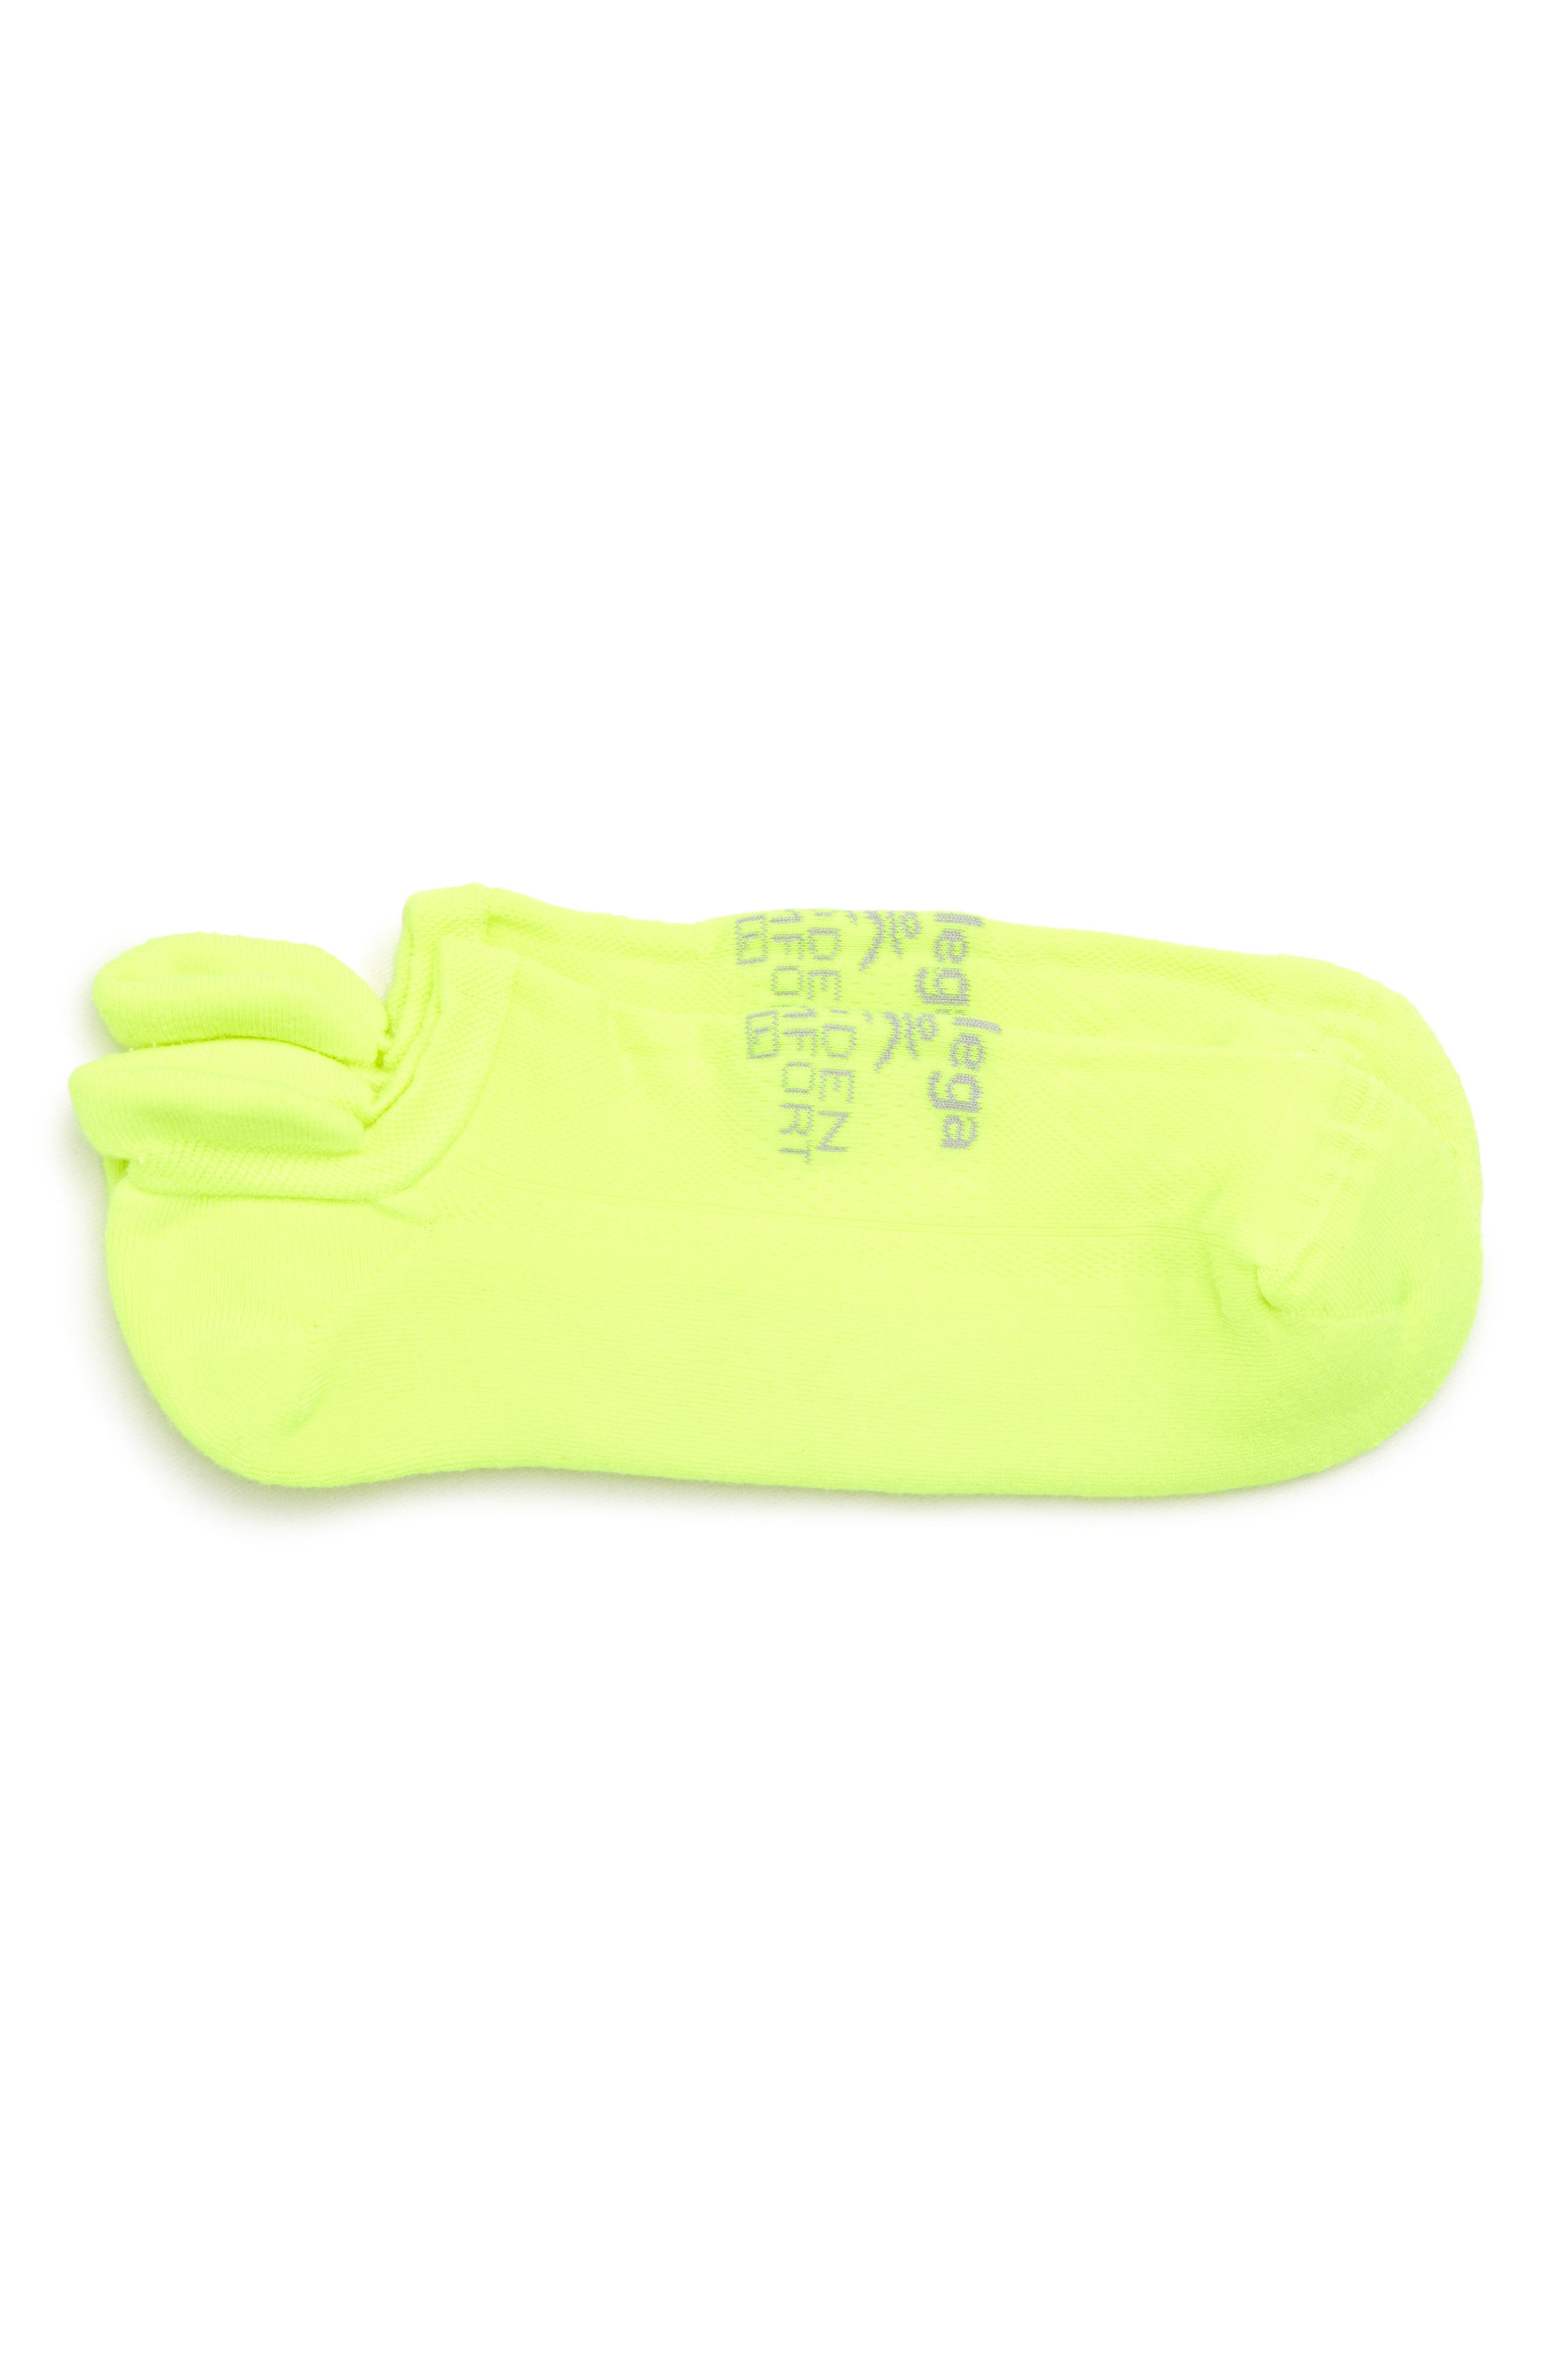 Hidden Comfort Socks,                             Main thumbnail 1, color,                             Zesty Lemon